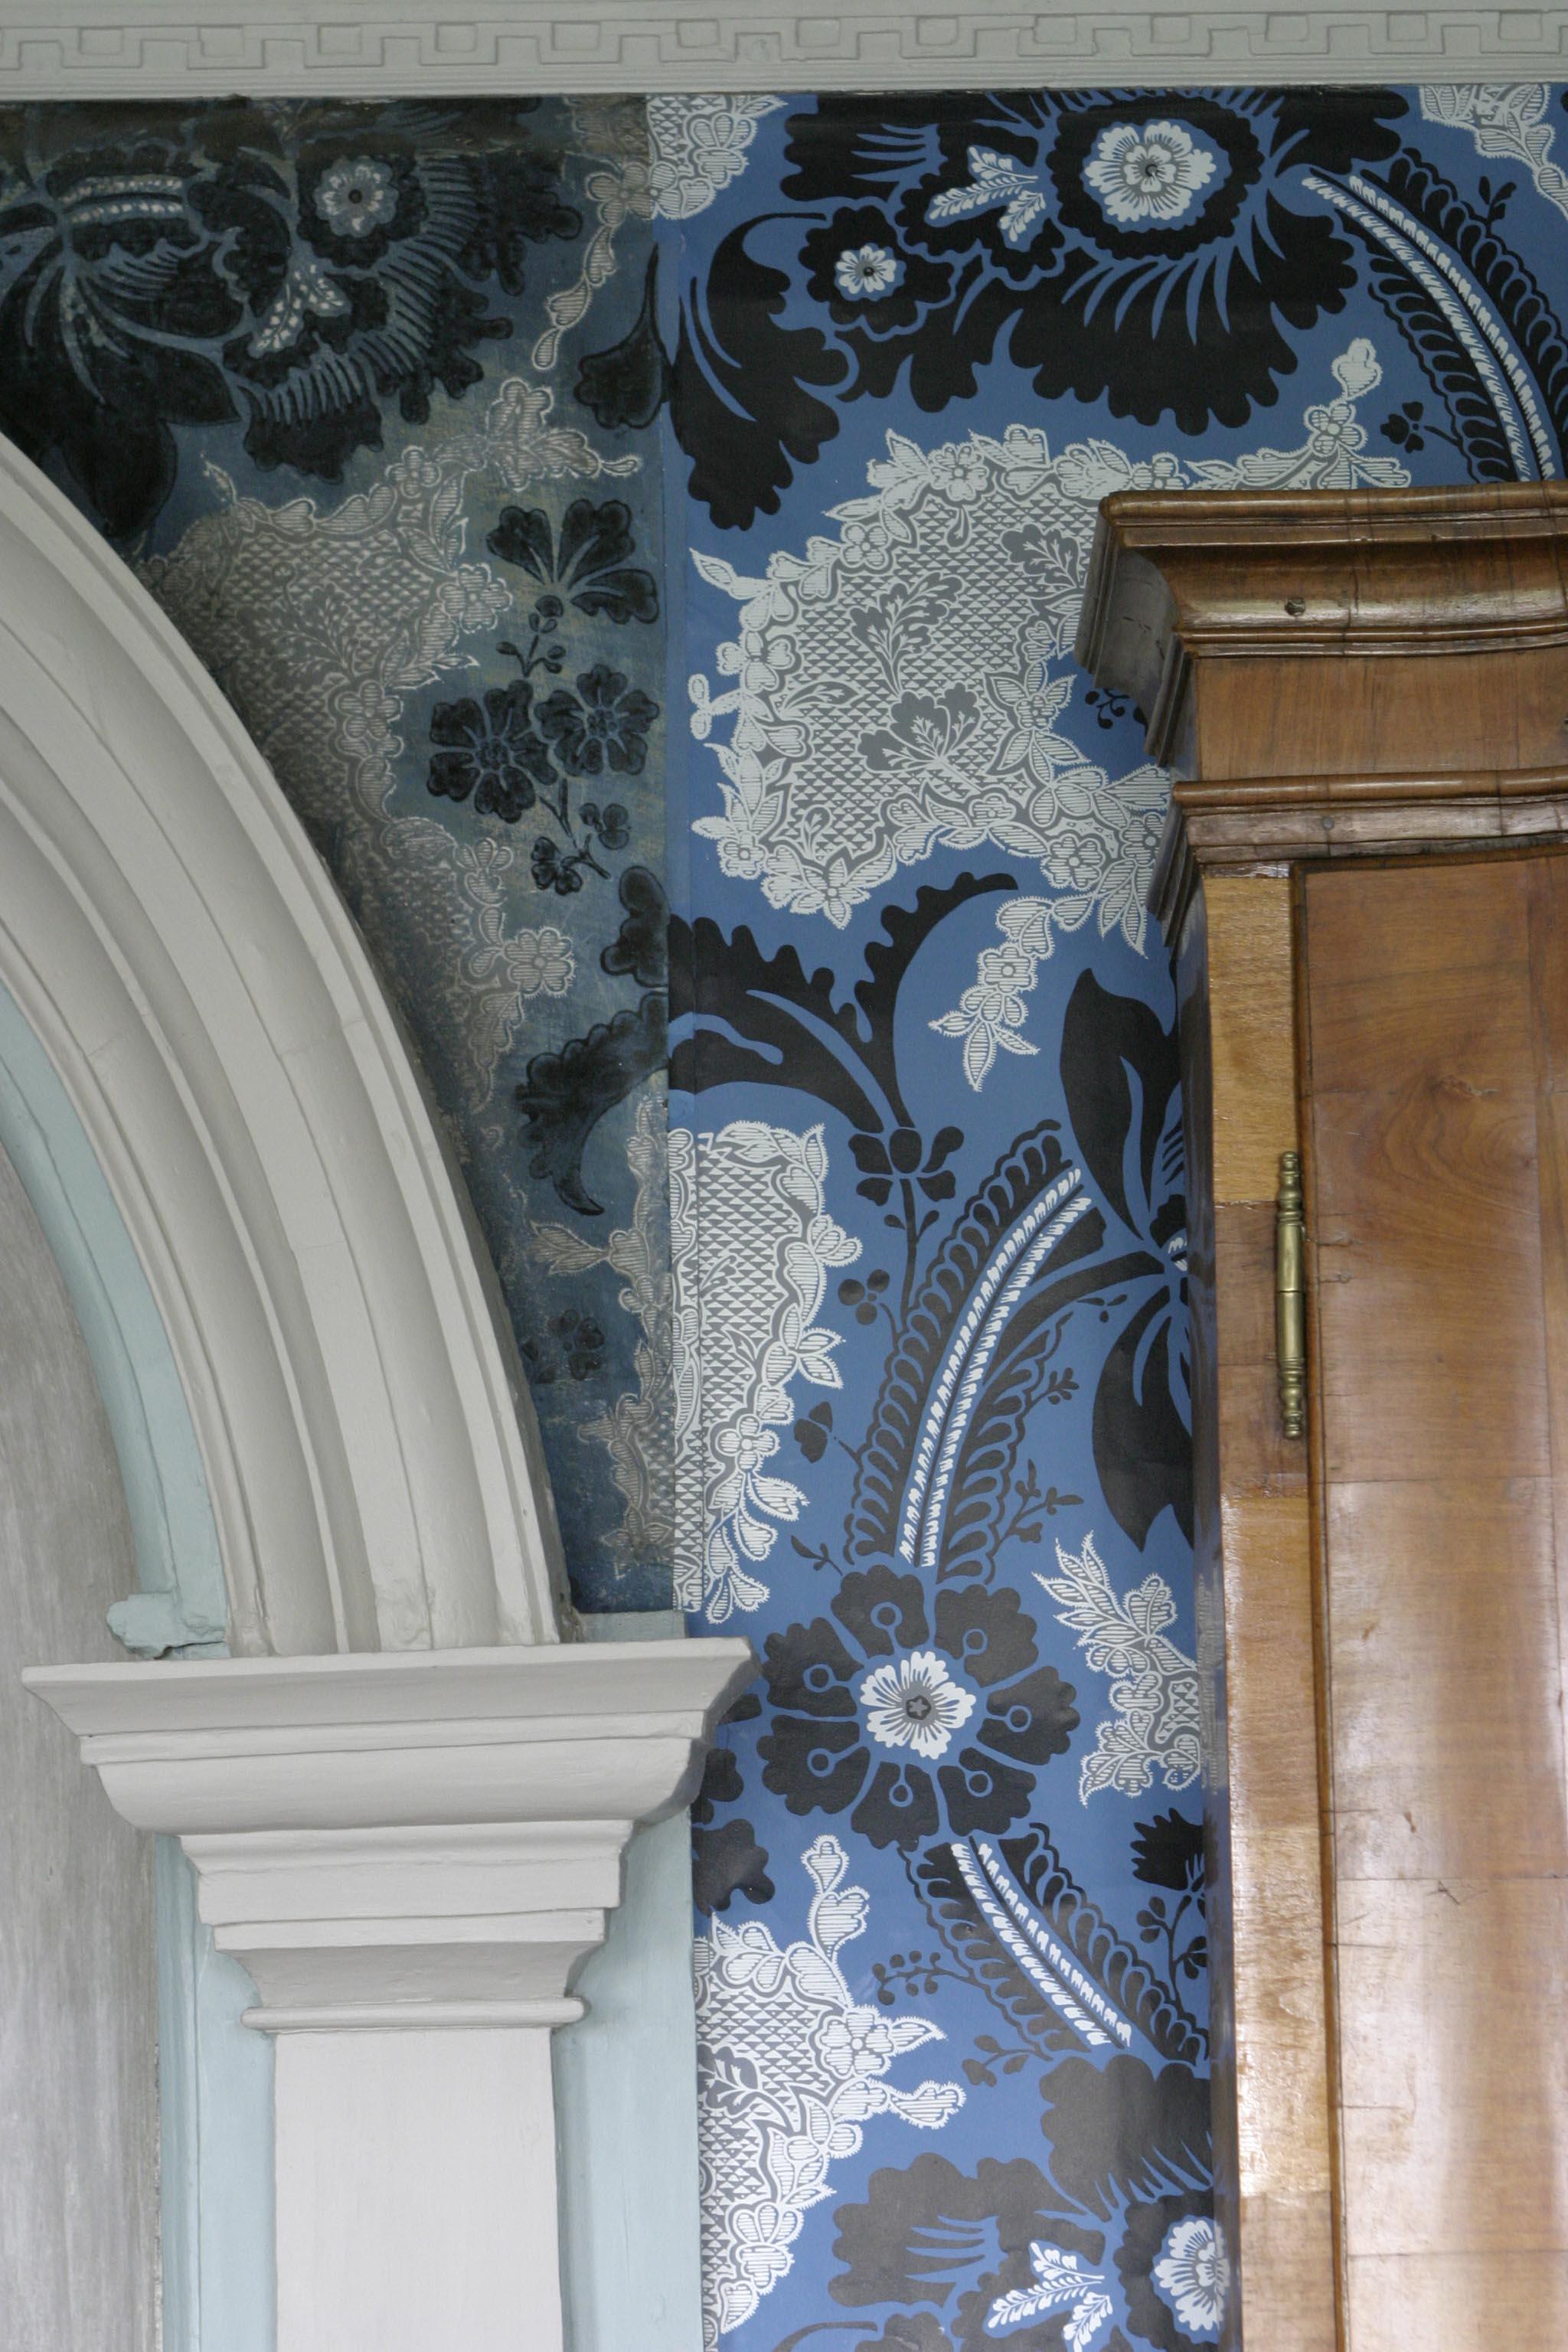 Rokokko tapet Damsgård fra Historiske Hus